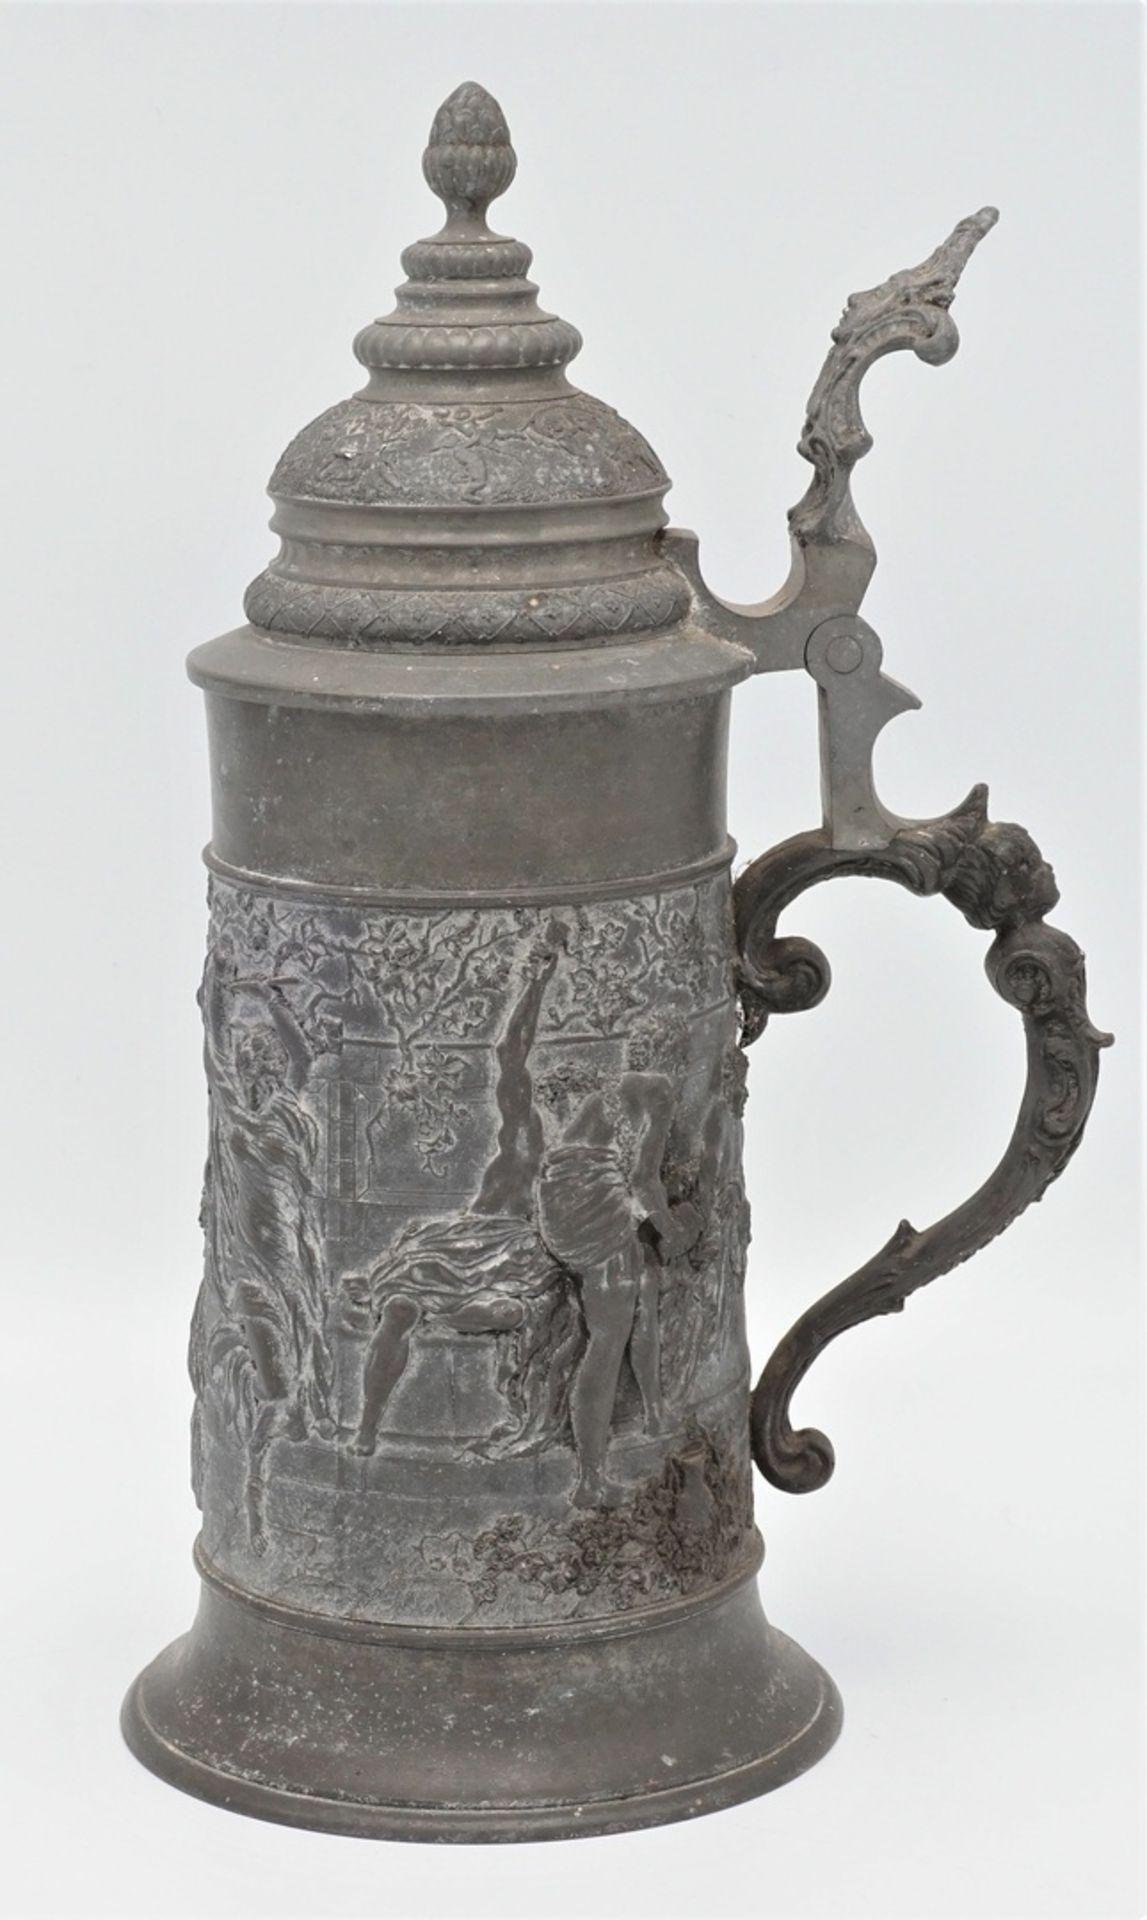 Bierkrug, Historismus